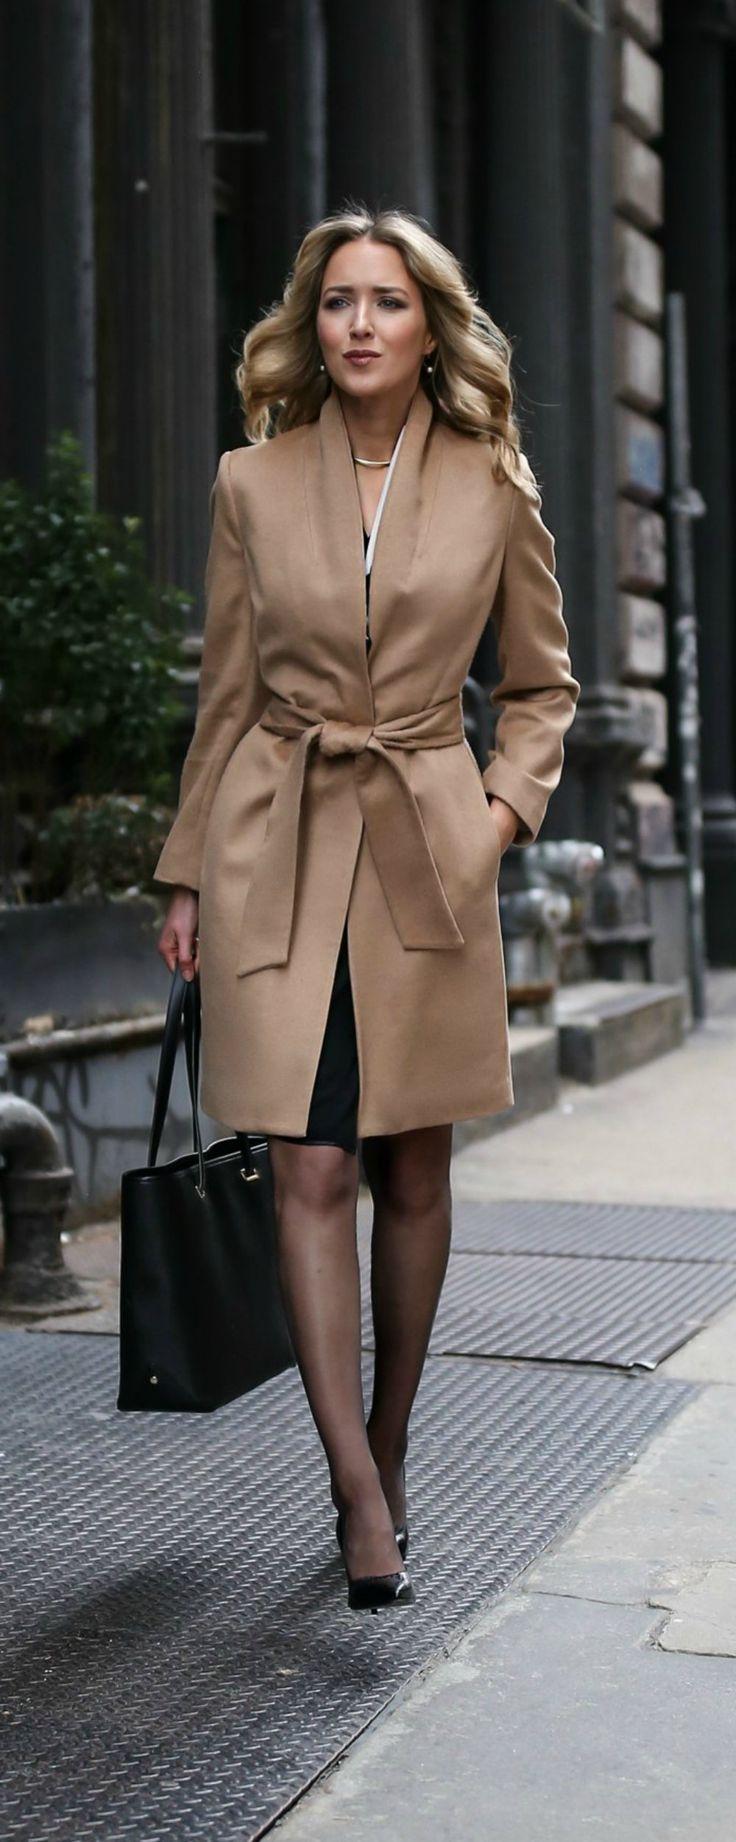 camel tie waist classic wool coat, black faux wrap front v-neck short sleeve sheath dress, sheer black tights, timeless black pointed toe pumps, gold choker necklace, work tote bag  |  @mmlafleur